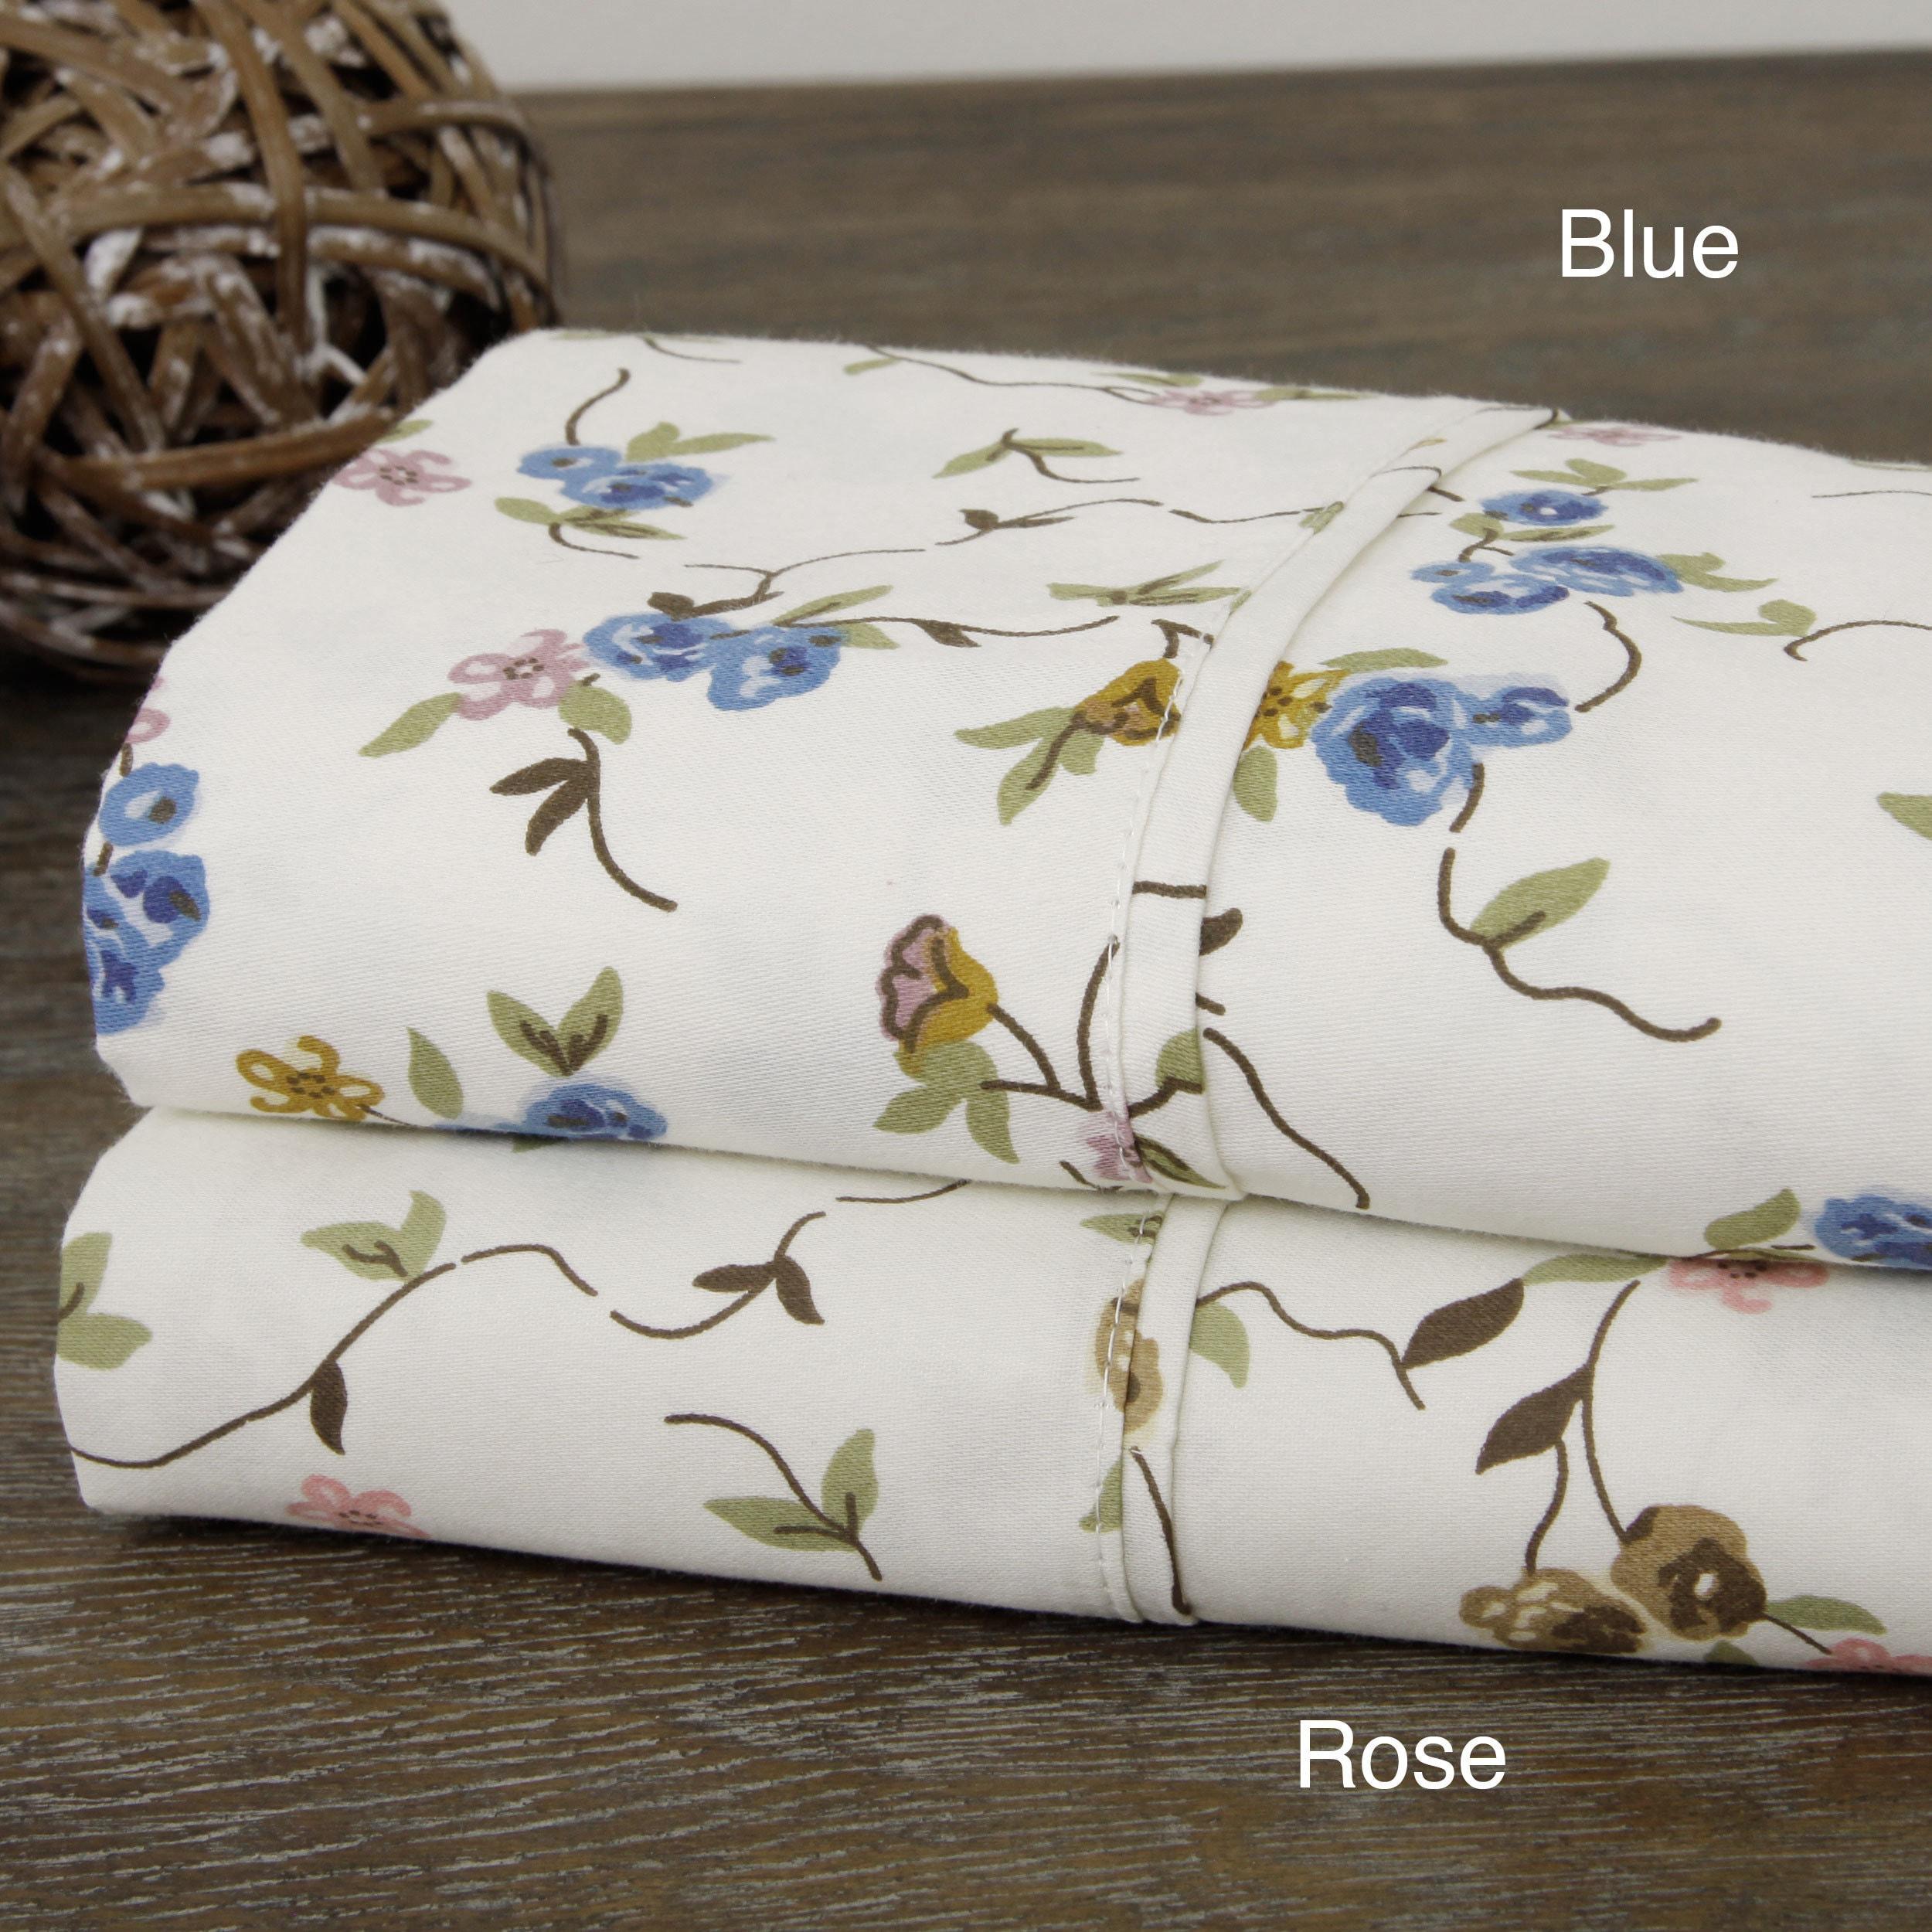 DOPO Floral Print Cotton Blend Sheet Set (King - Rose), Pink